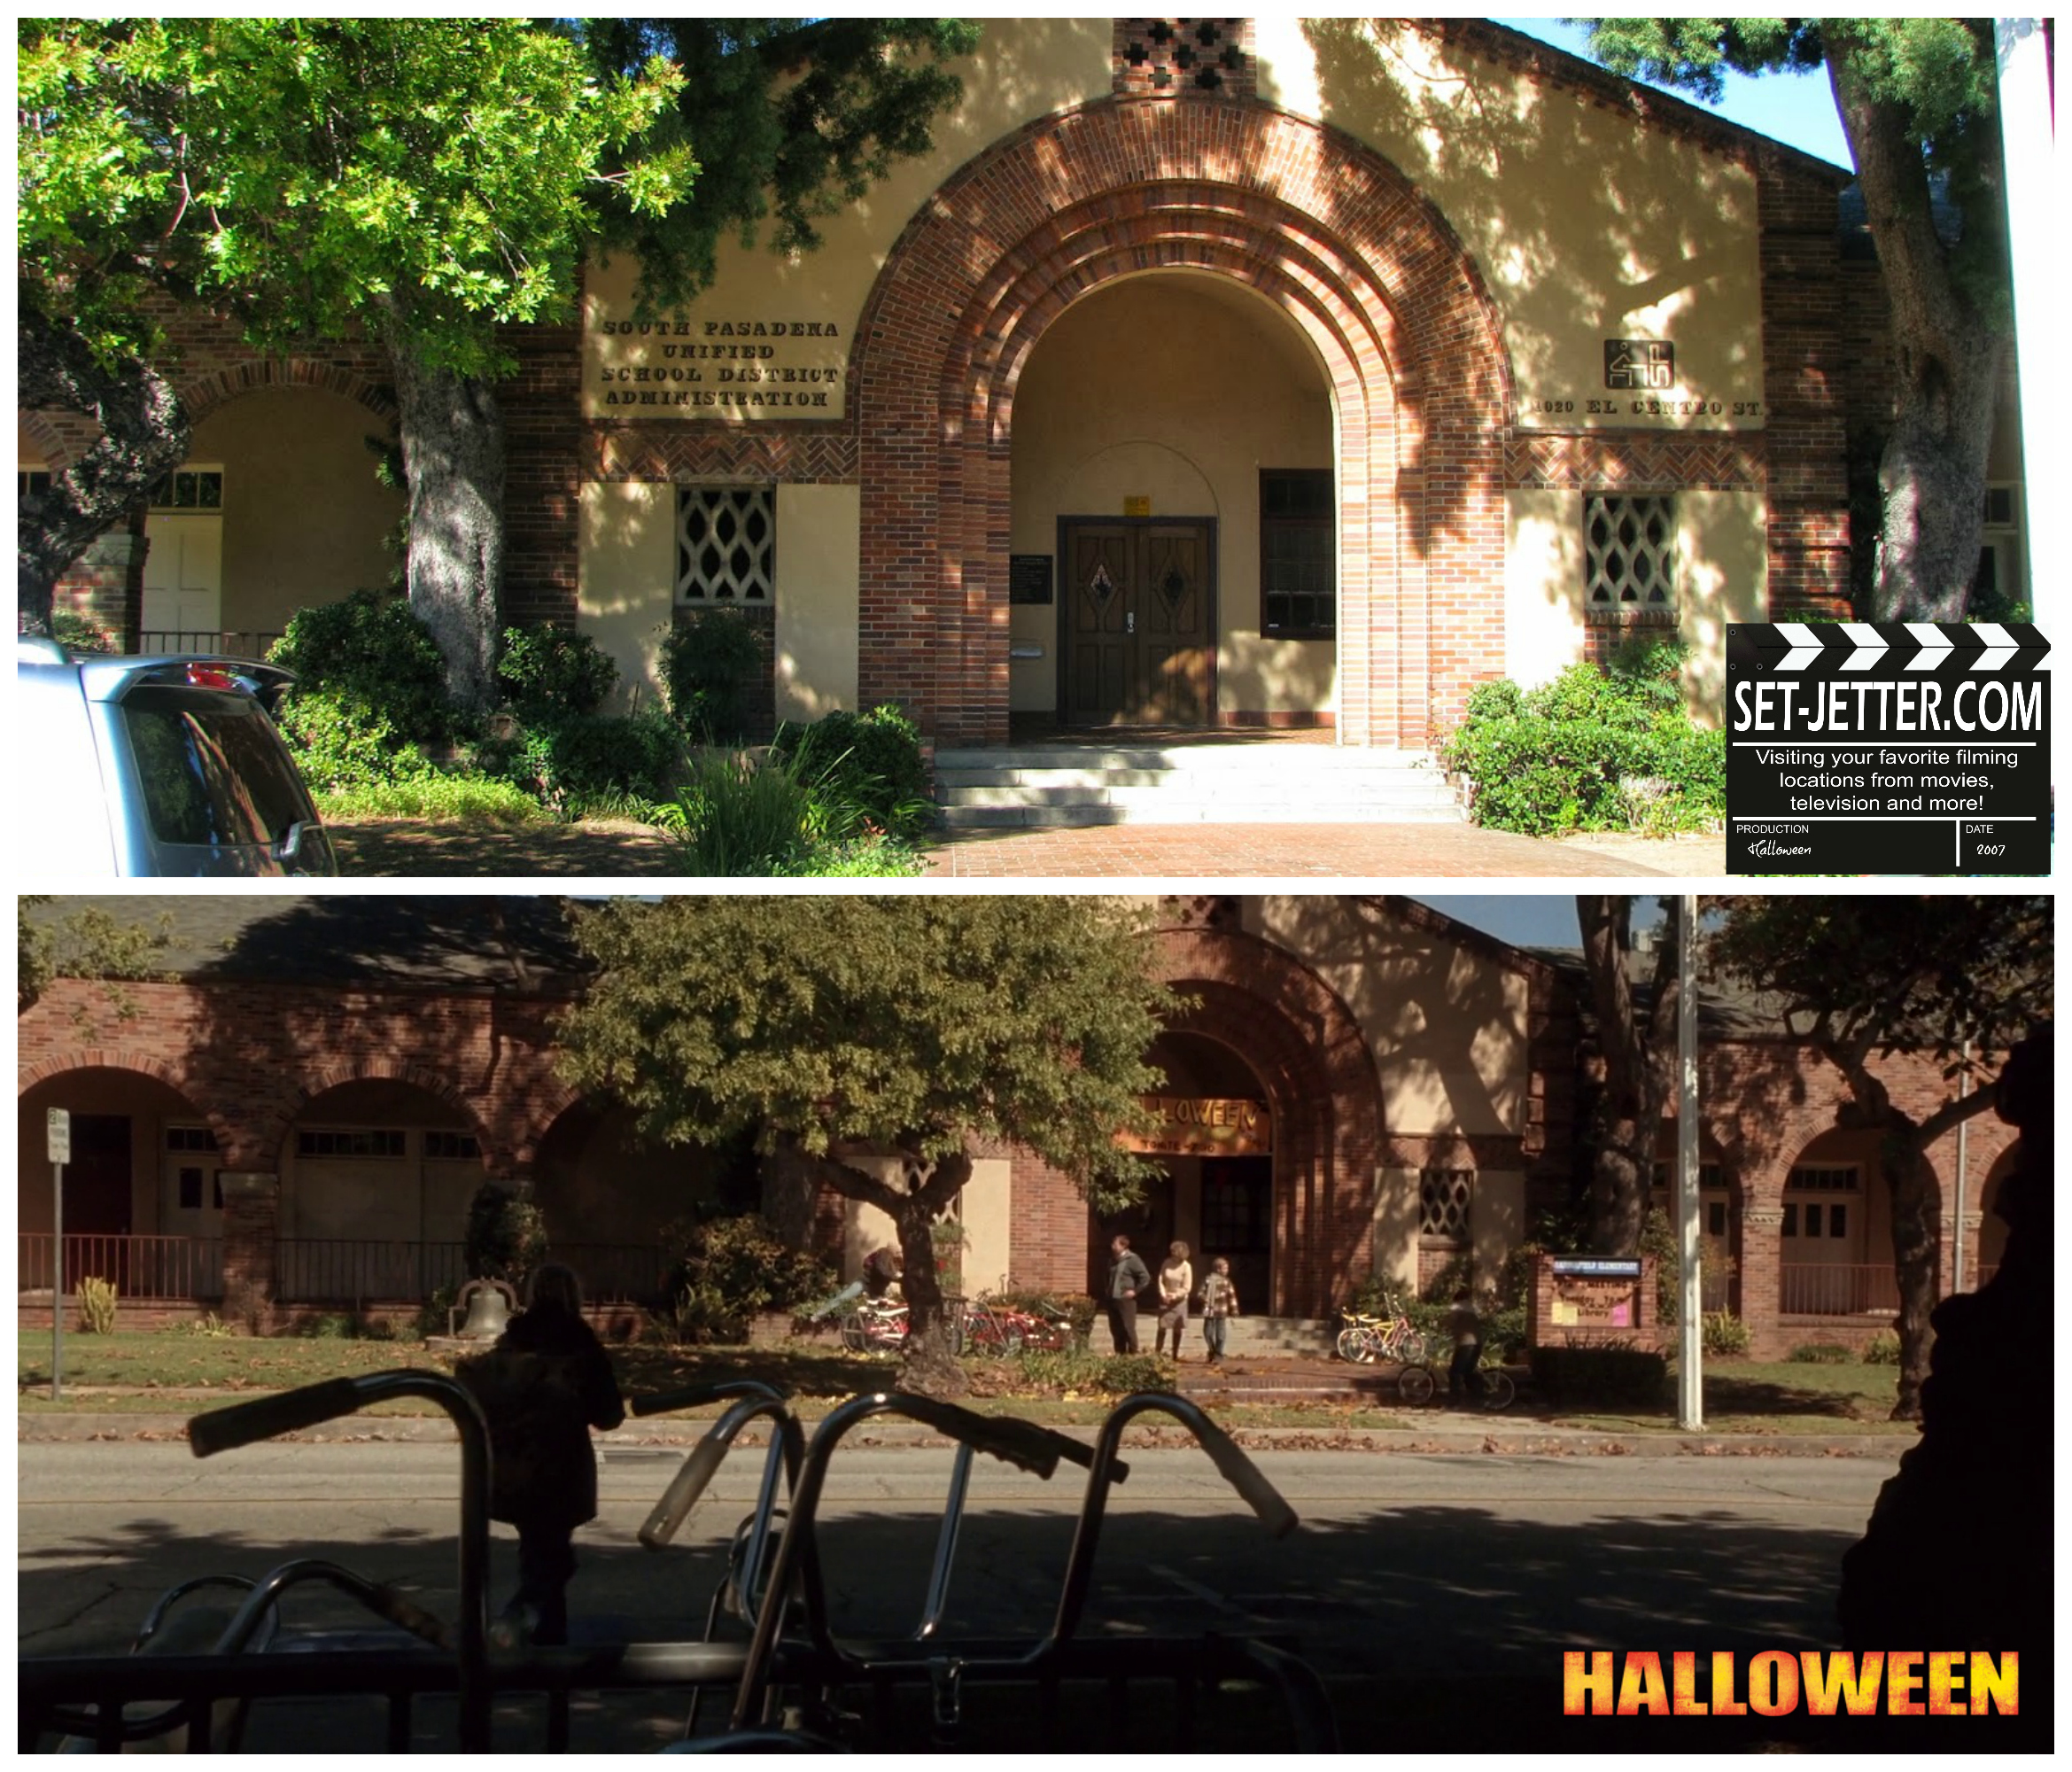 Halloween 2007 comparison 24.jpg